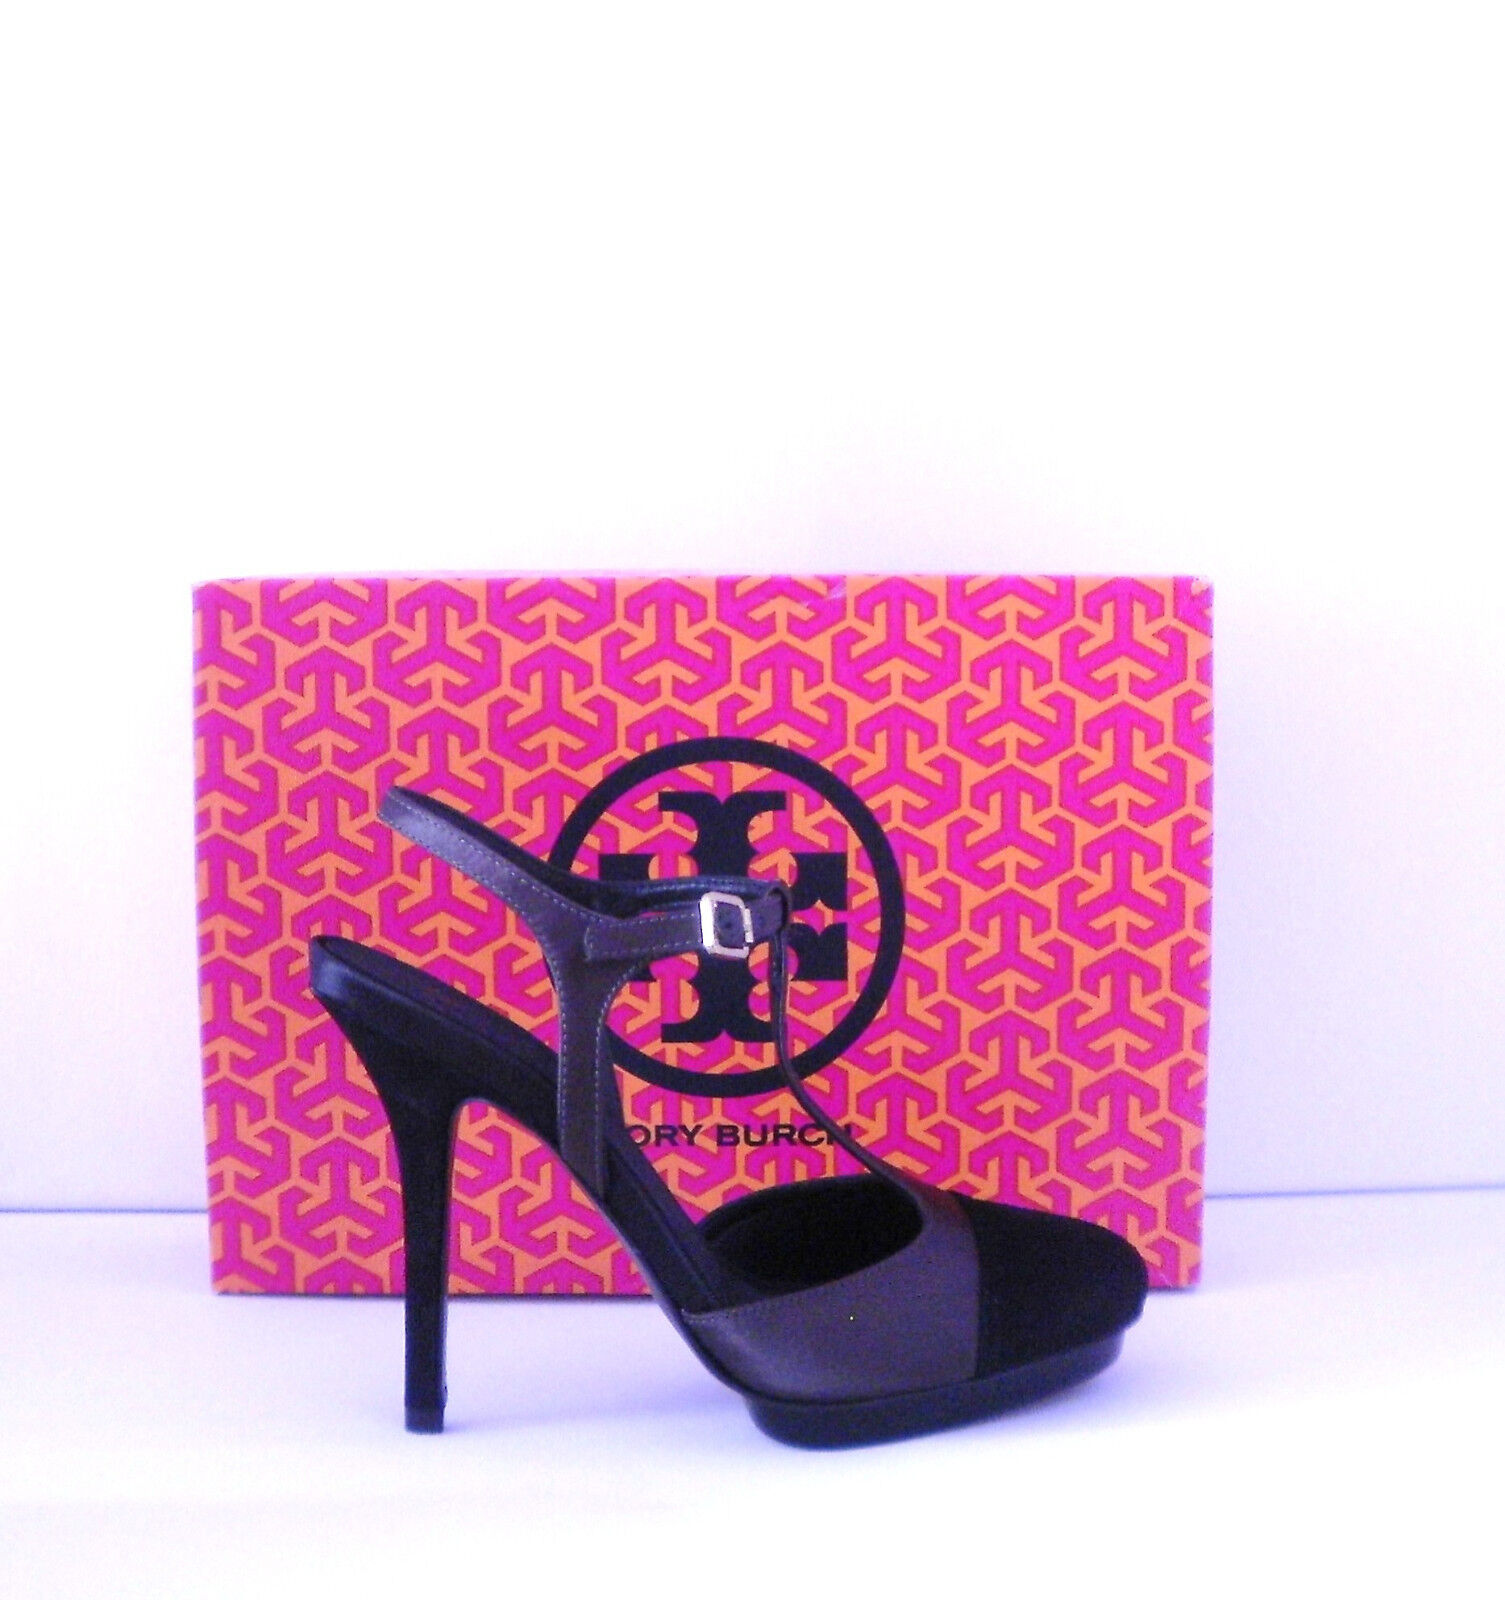 Tory Burch schuhe 8 New With Box  395 395 395 Mandy High Heels 2a01a4